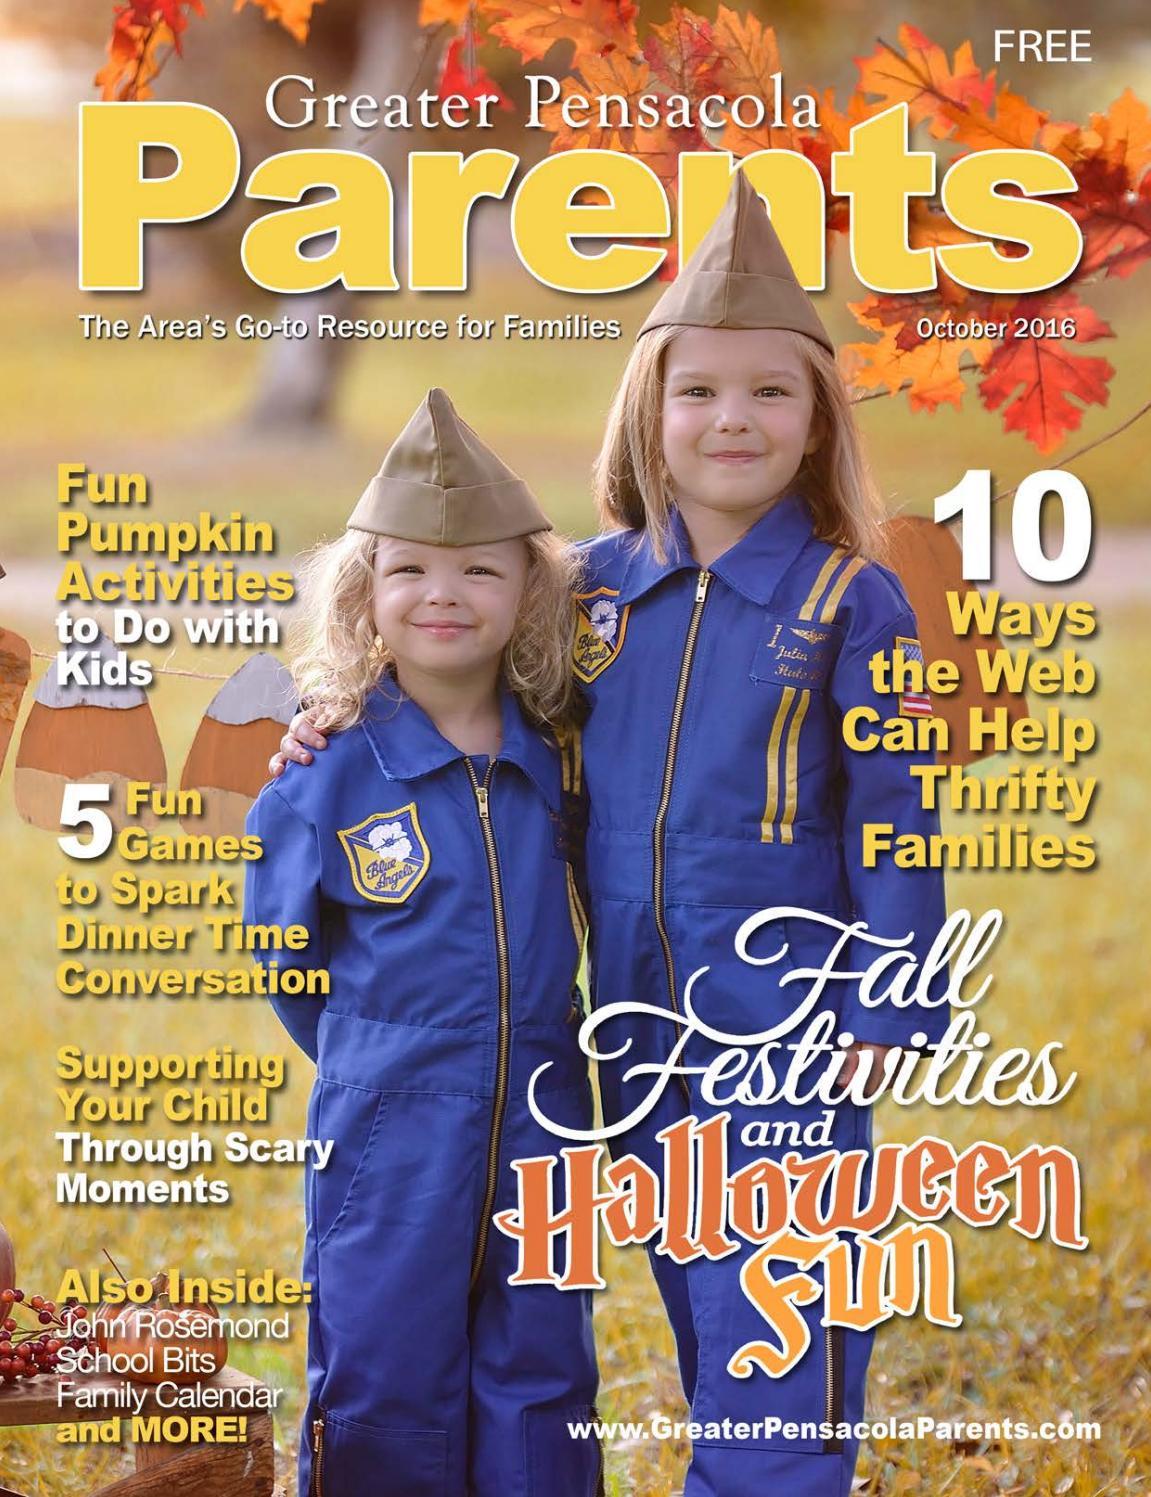 Greater Pensacola Parents October 2016